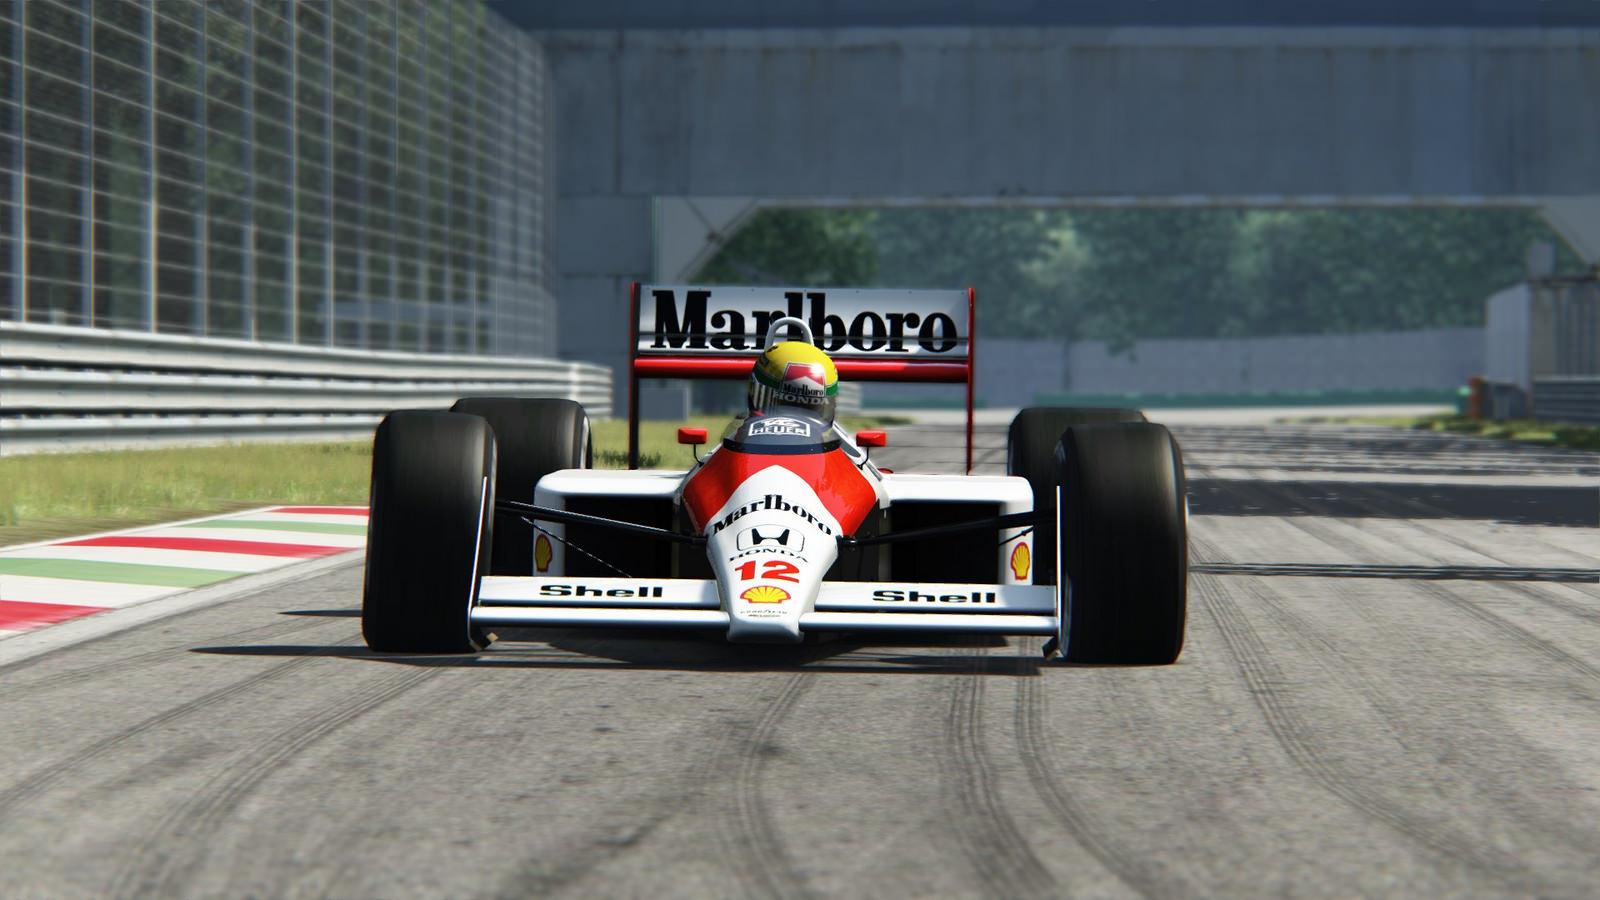 Latest Car Wallpaper 2014 Mclaren Mp4 4 1 0 For Assetto Corsa Released Virtualr